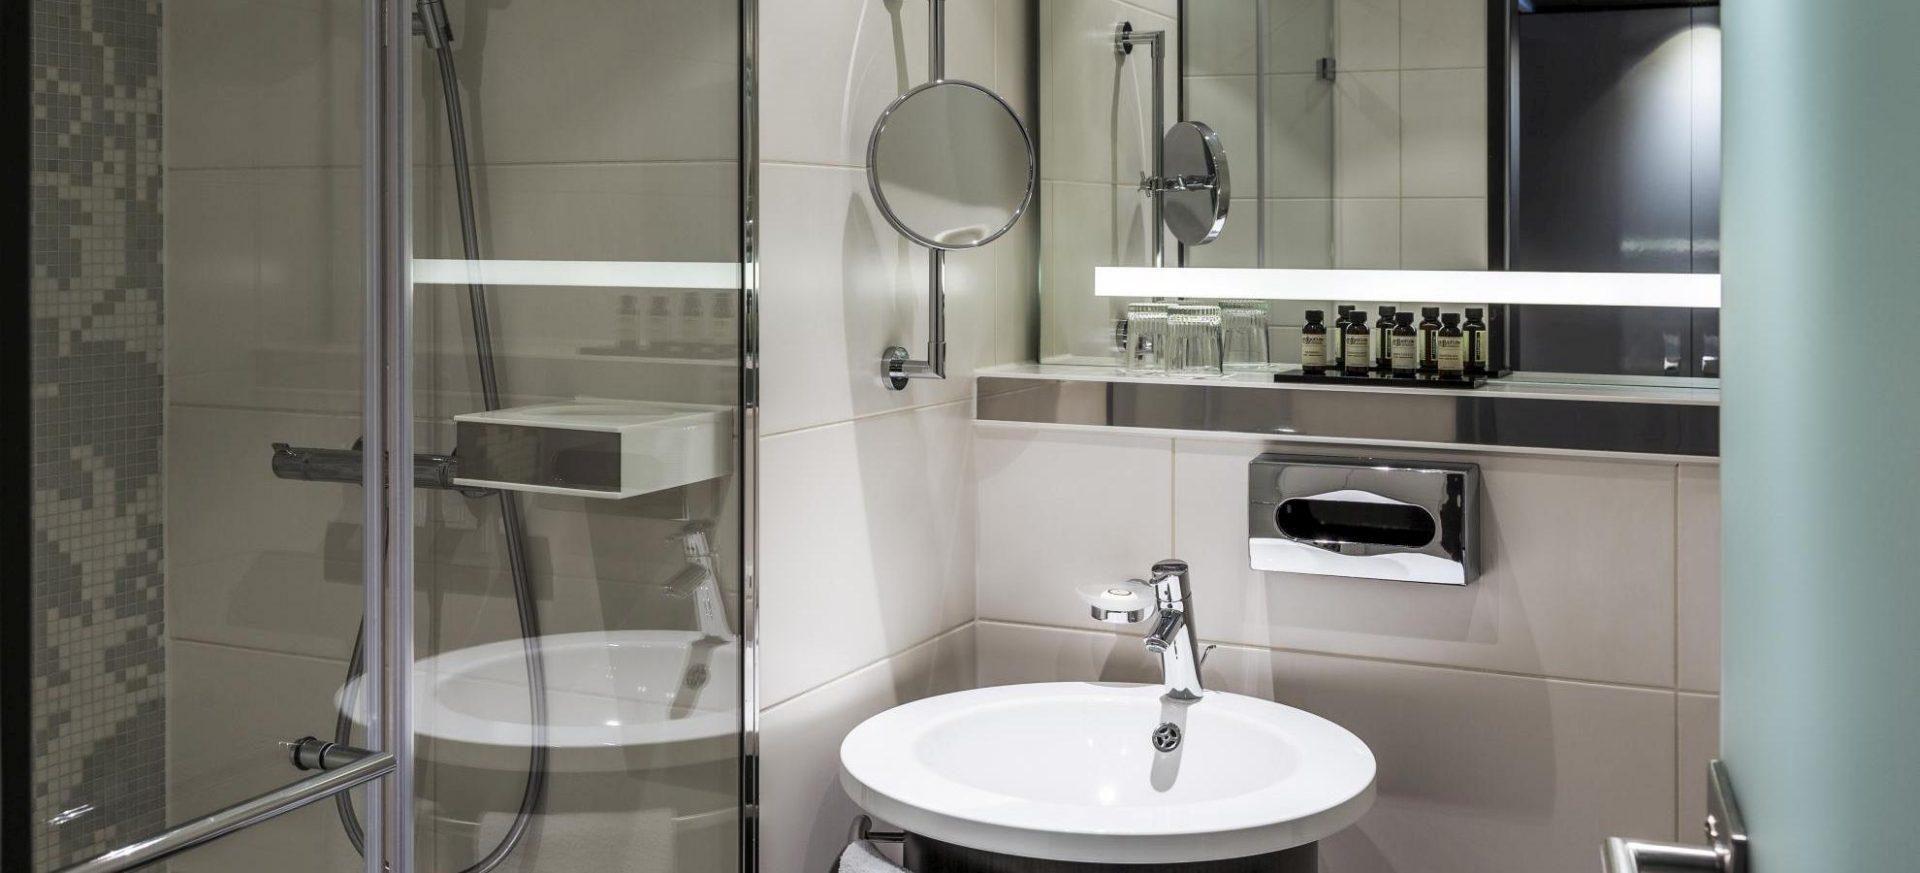 Pullman Munich Executive Zimmer Bad / Executive Room bath